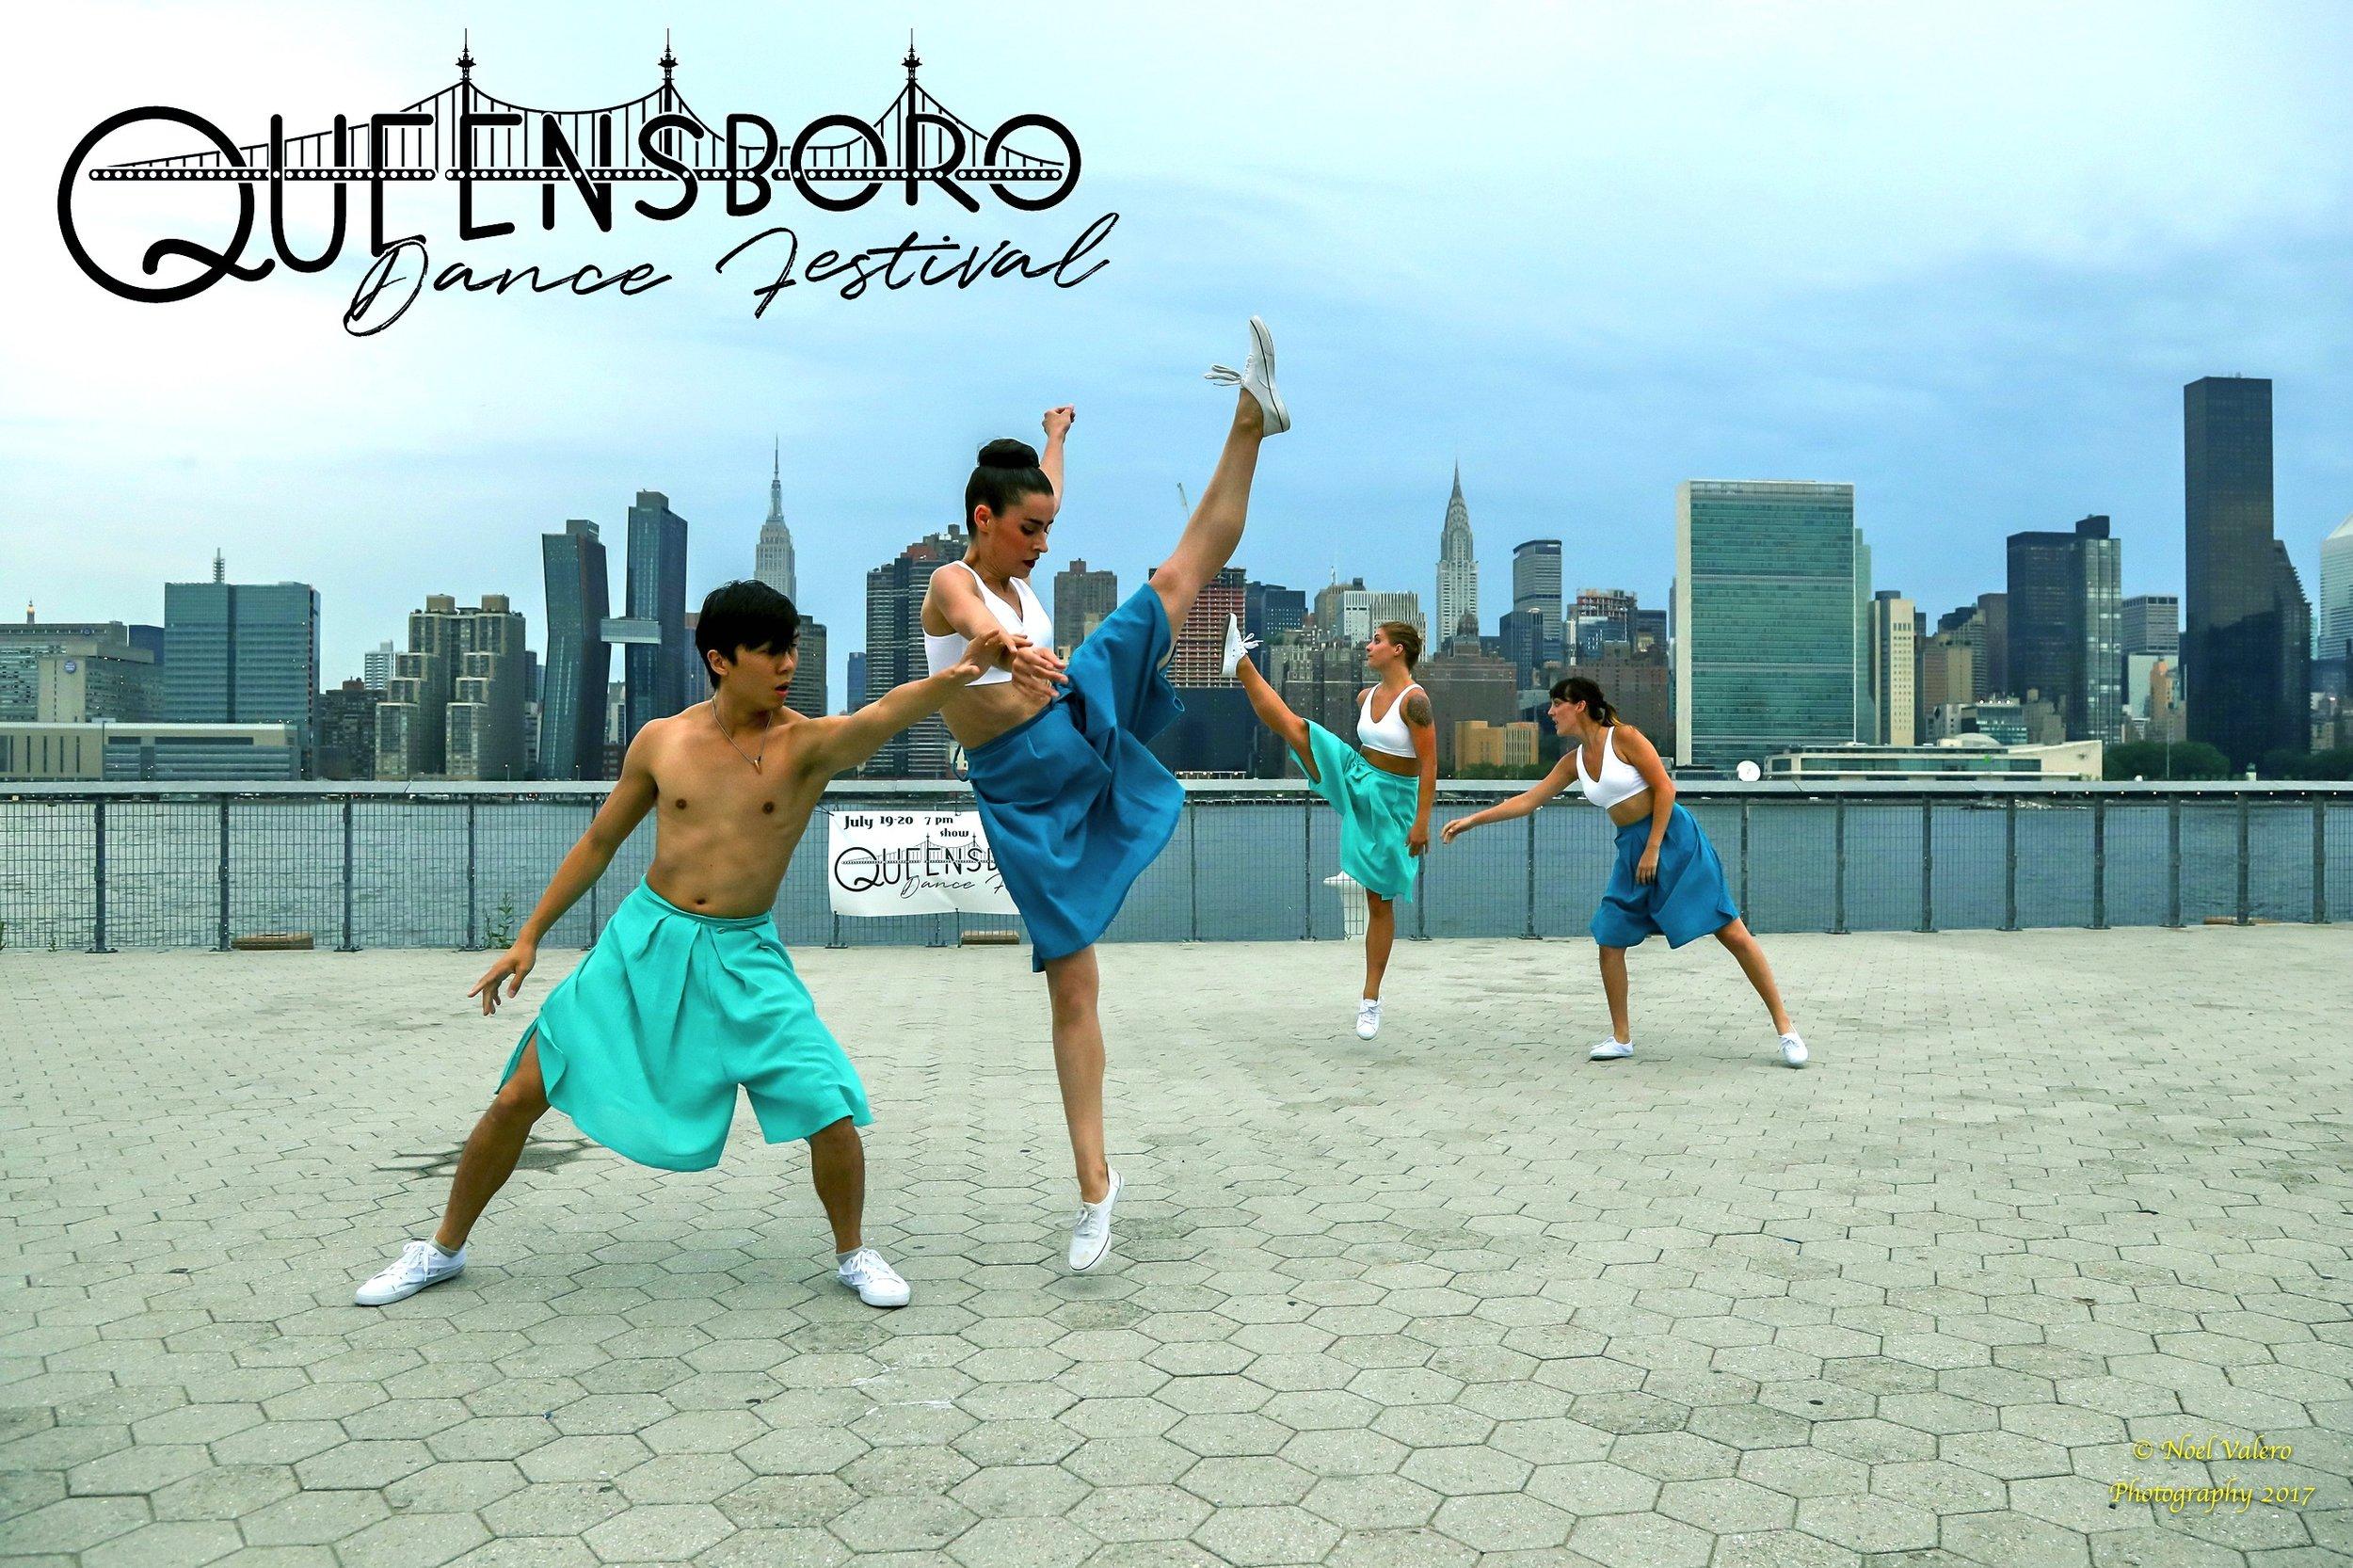 Queensboro Dance Festival | Queens Council on the Arts